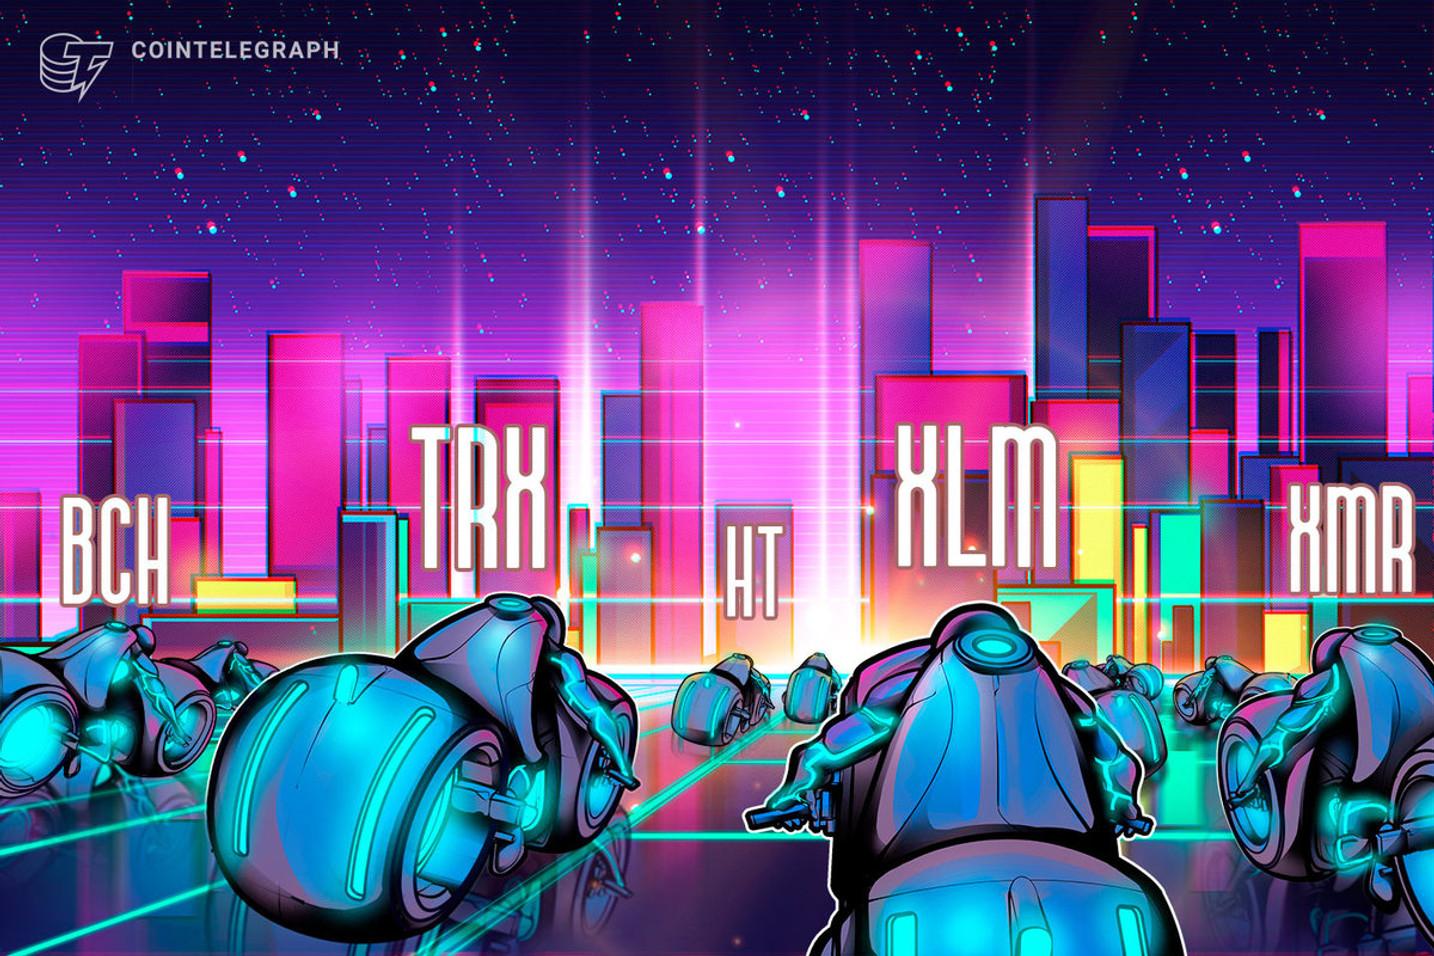 Top-5 Cryptos This Week: TRX, BCH, HT, XLM, XMR